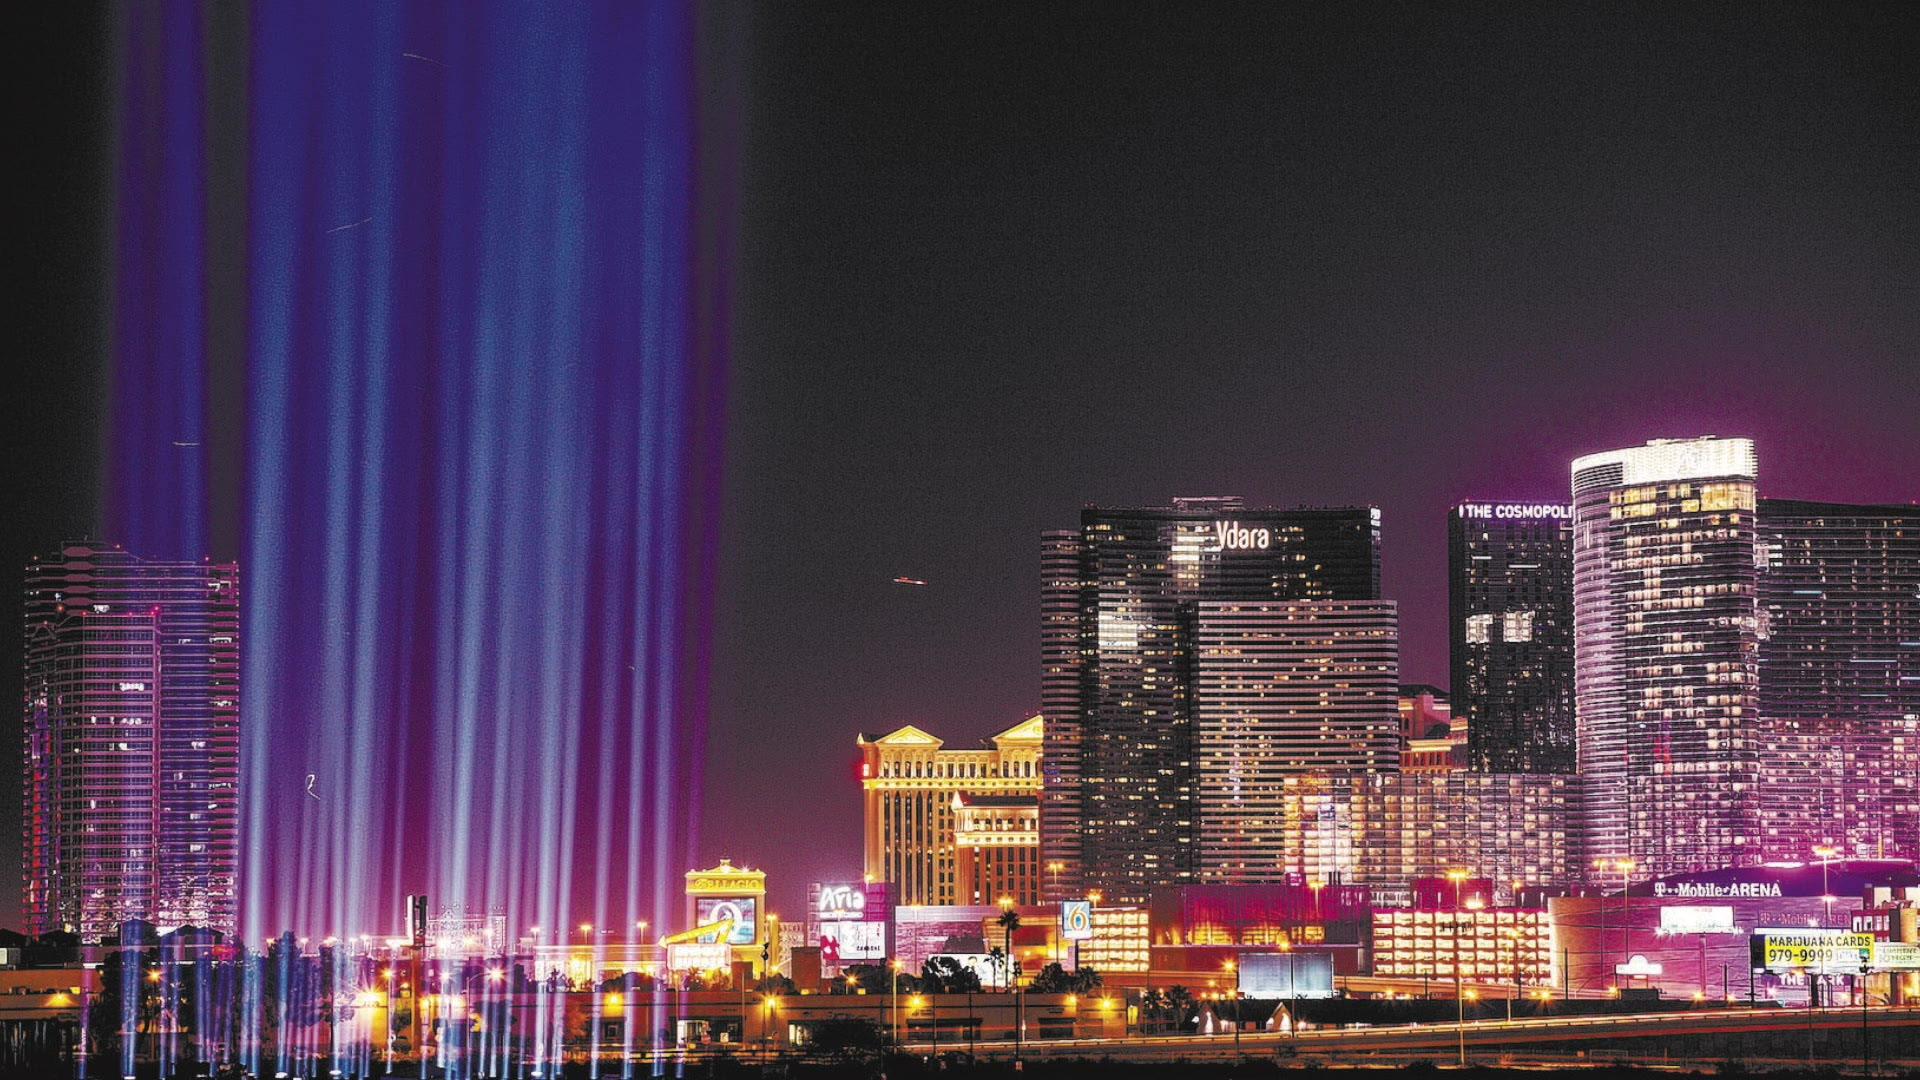 d008d84868 In stirring Las Vegas groundbreaking ceremony